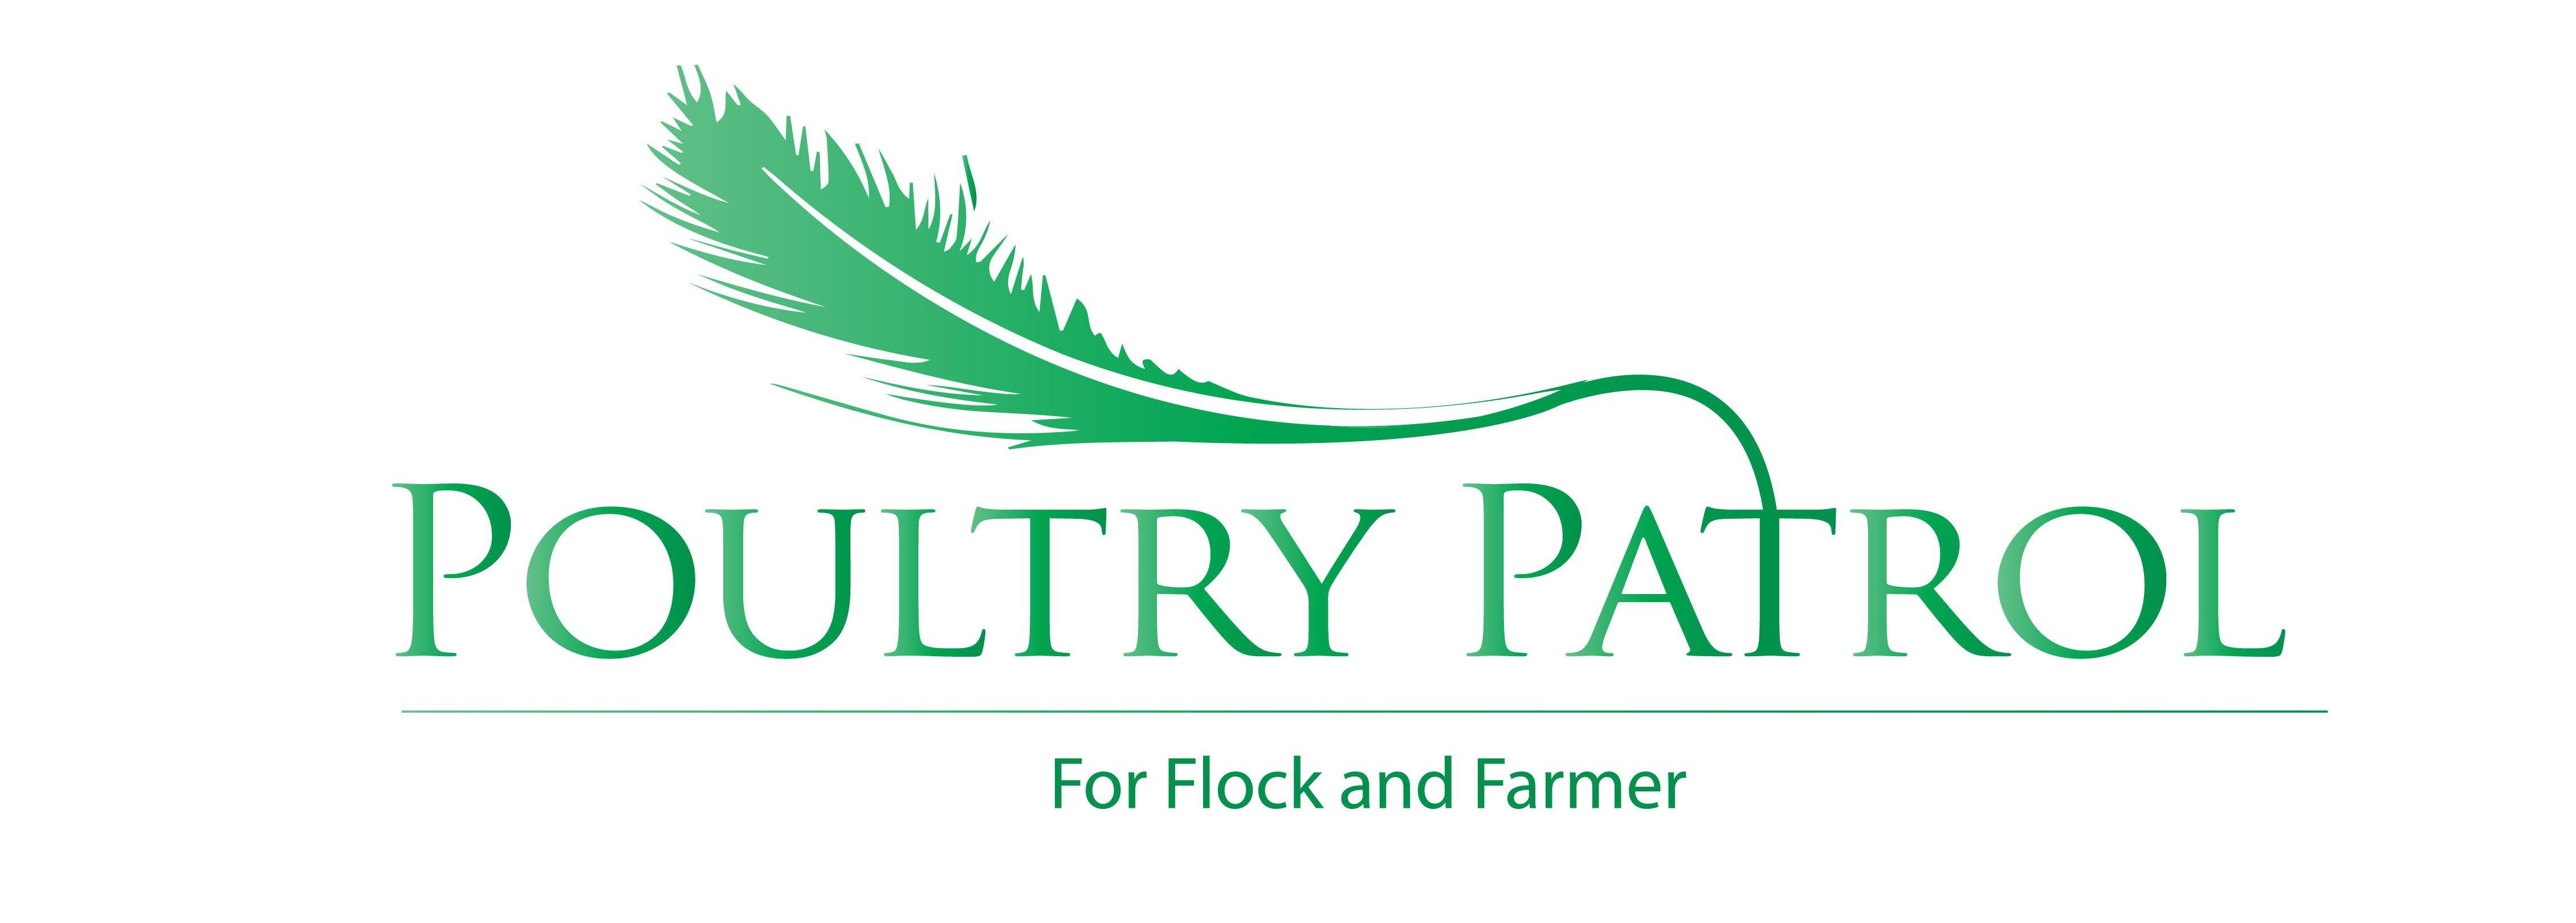 Poultry Patrol